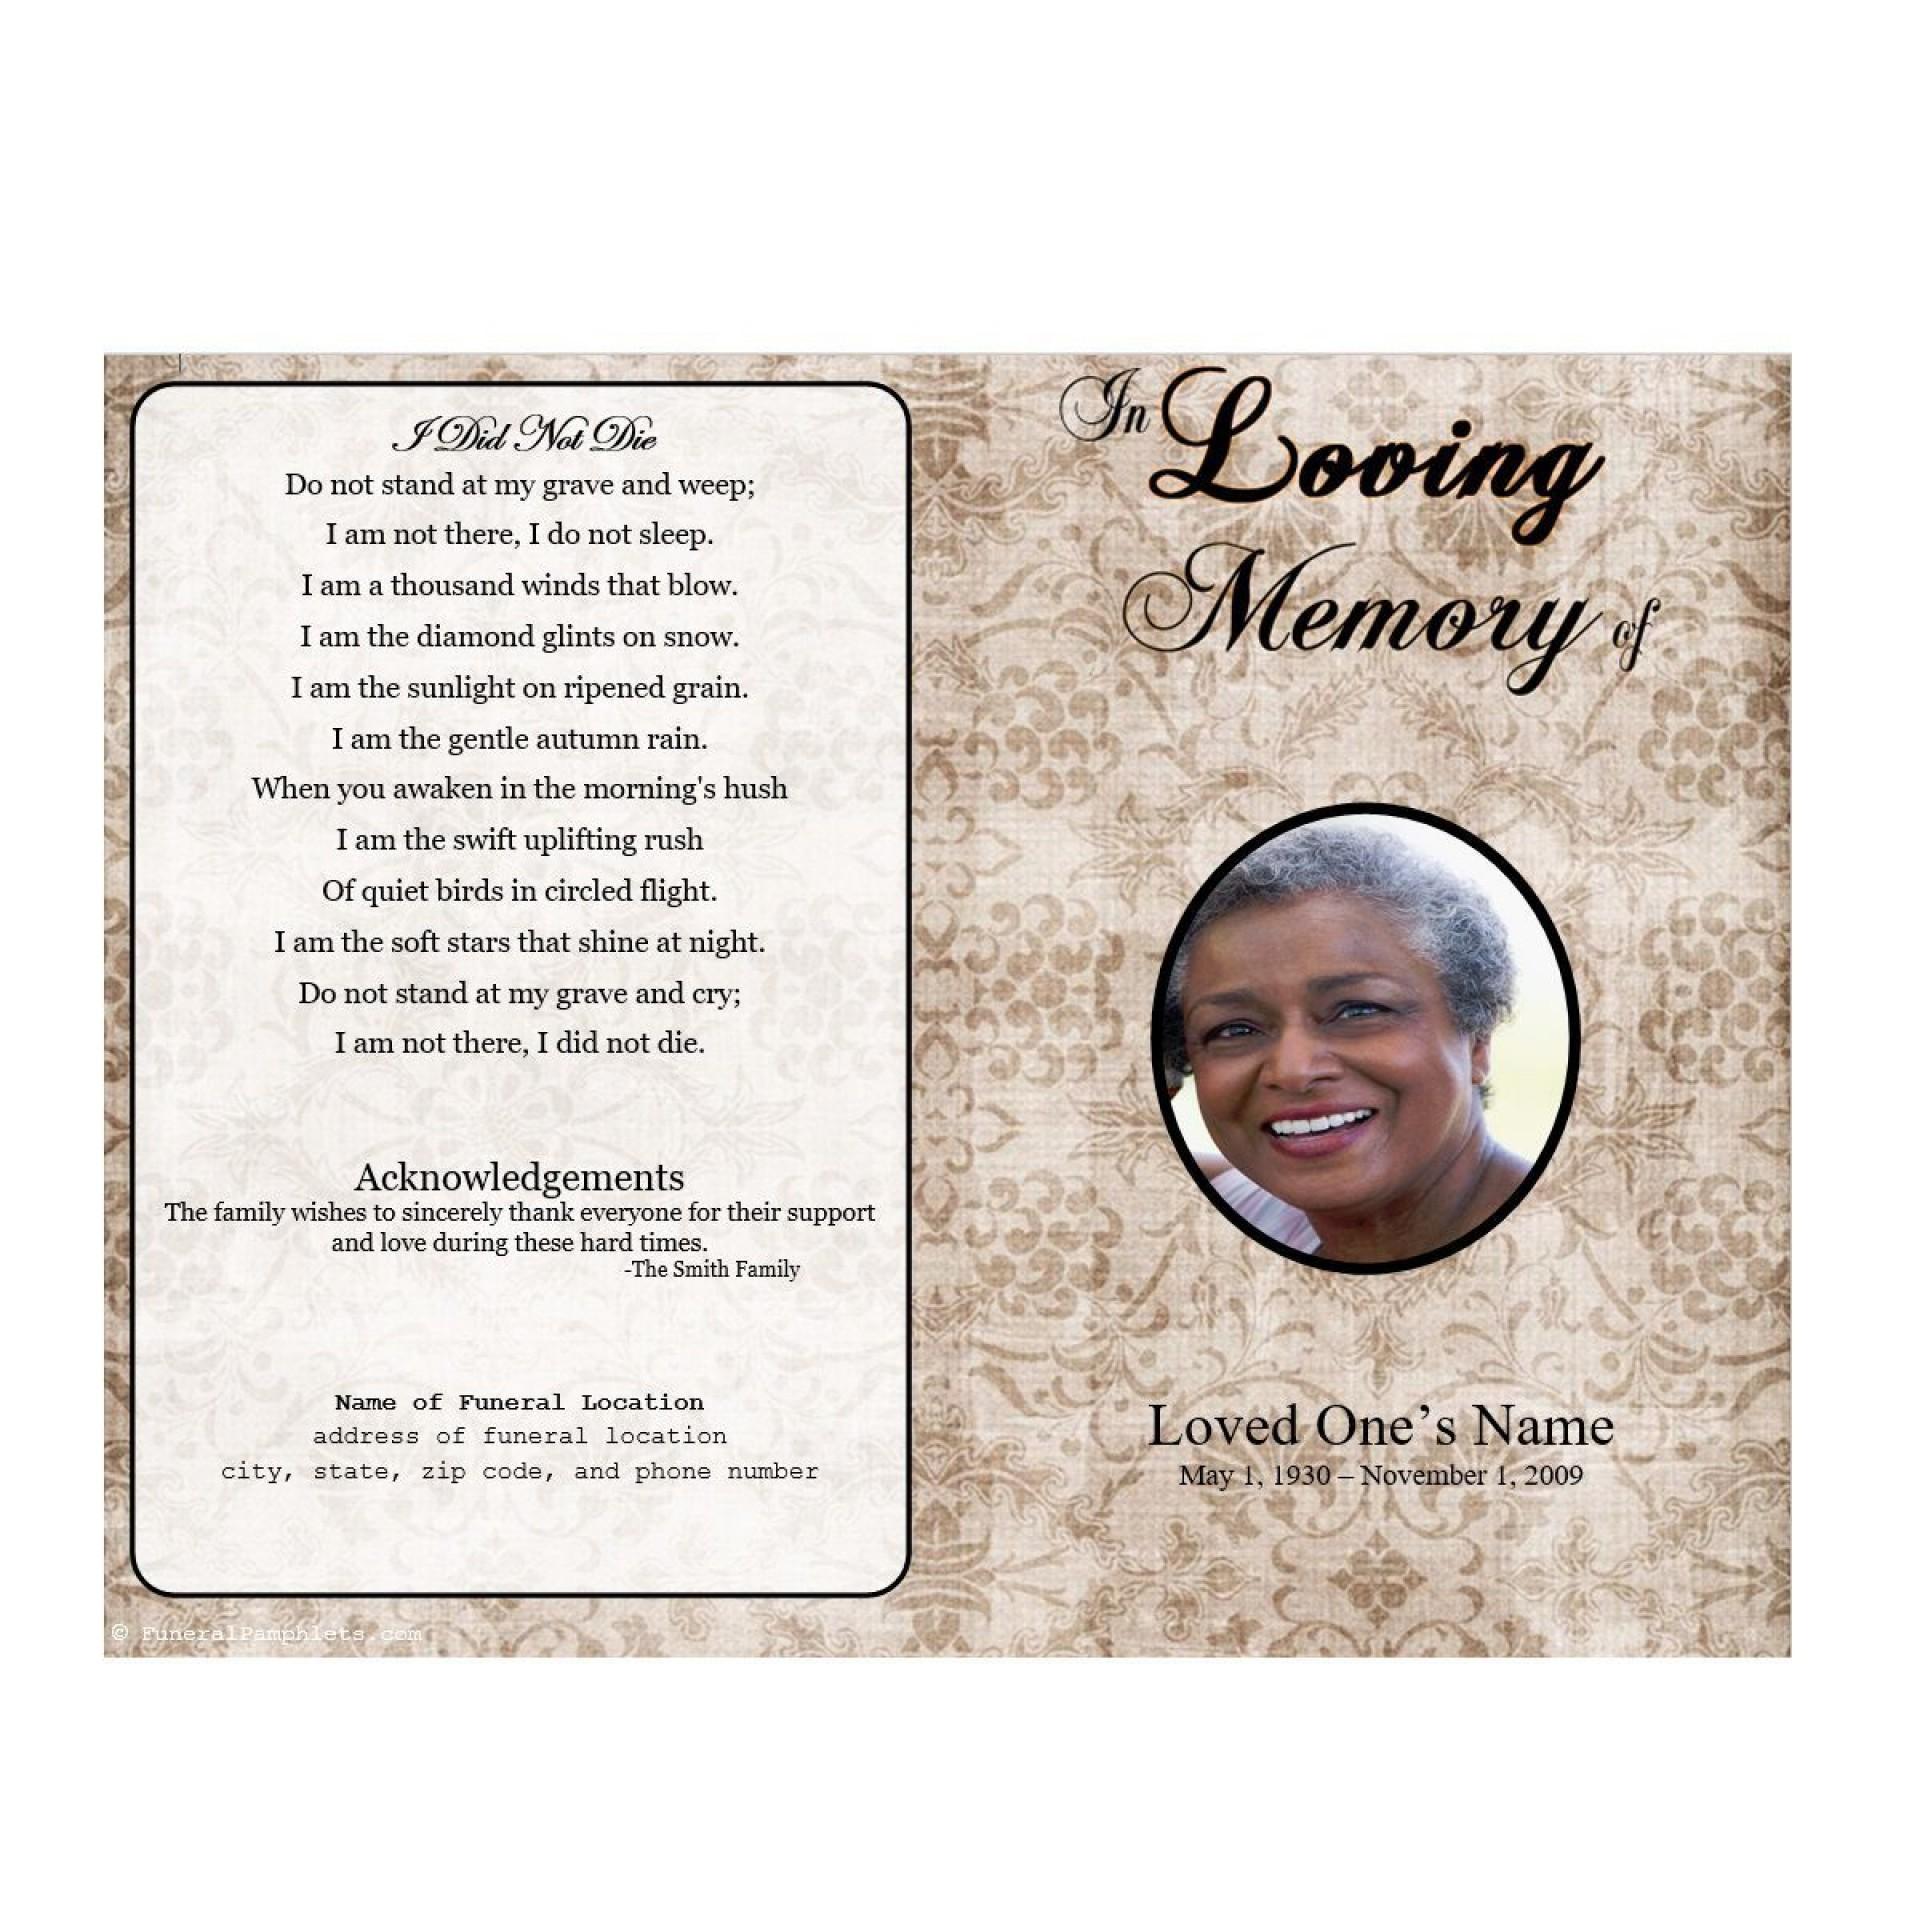 005 Beautiful Sample Wording For Funeral Program High Resolution  Programs1920